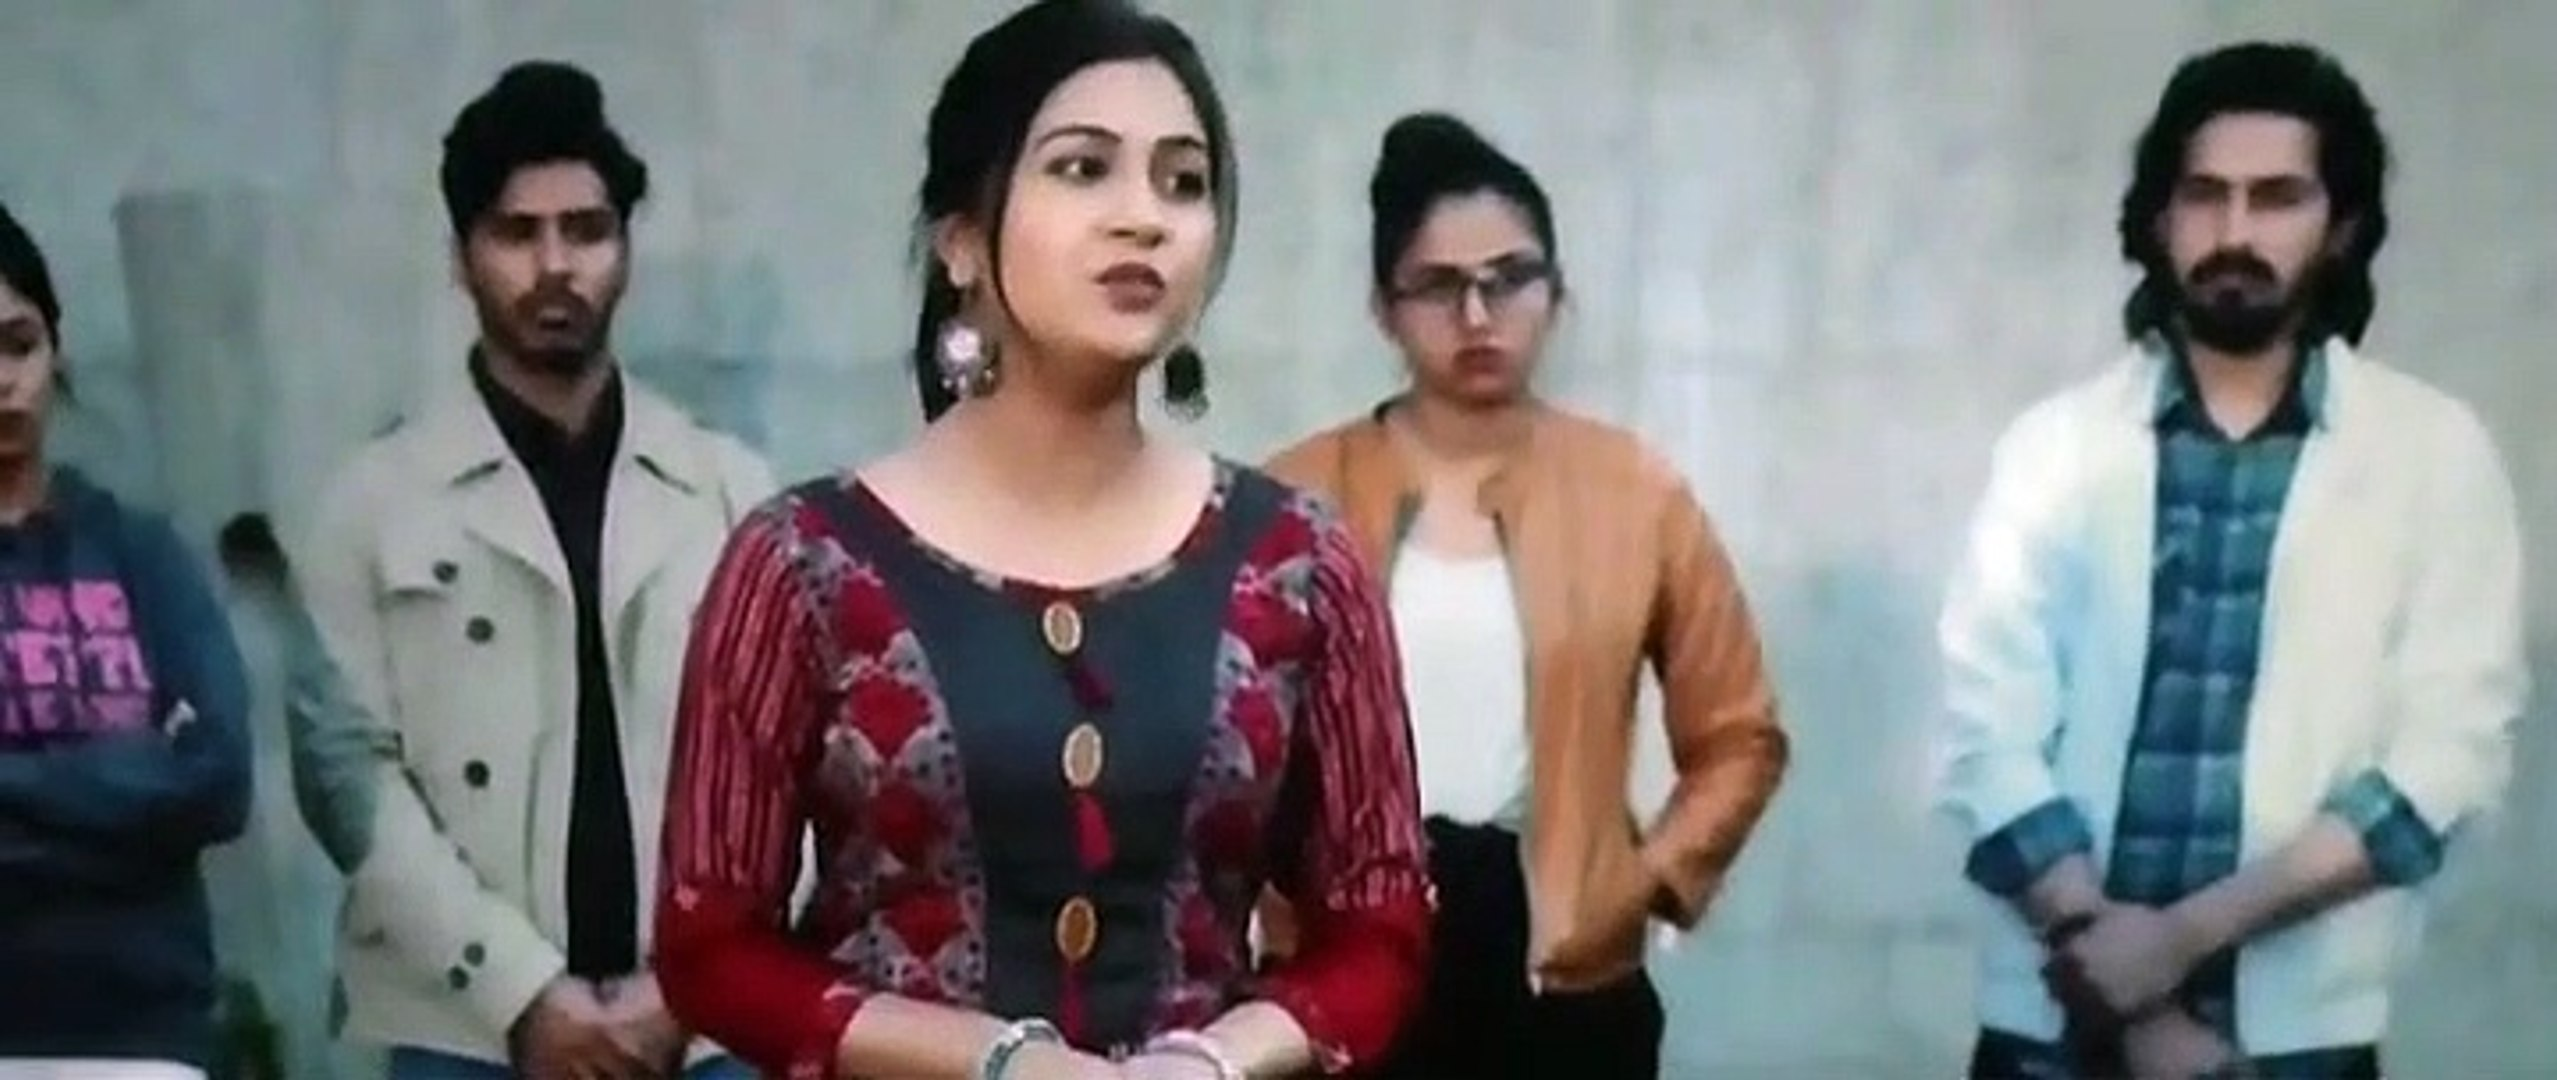 New Indian punjabi movie Sikander 2 (2019) Part 3 - 3